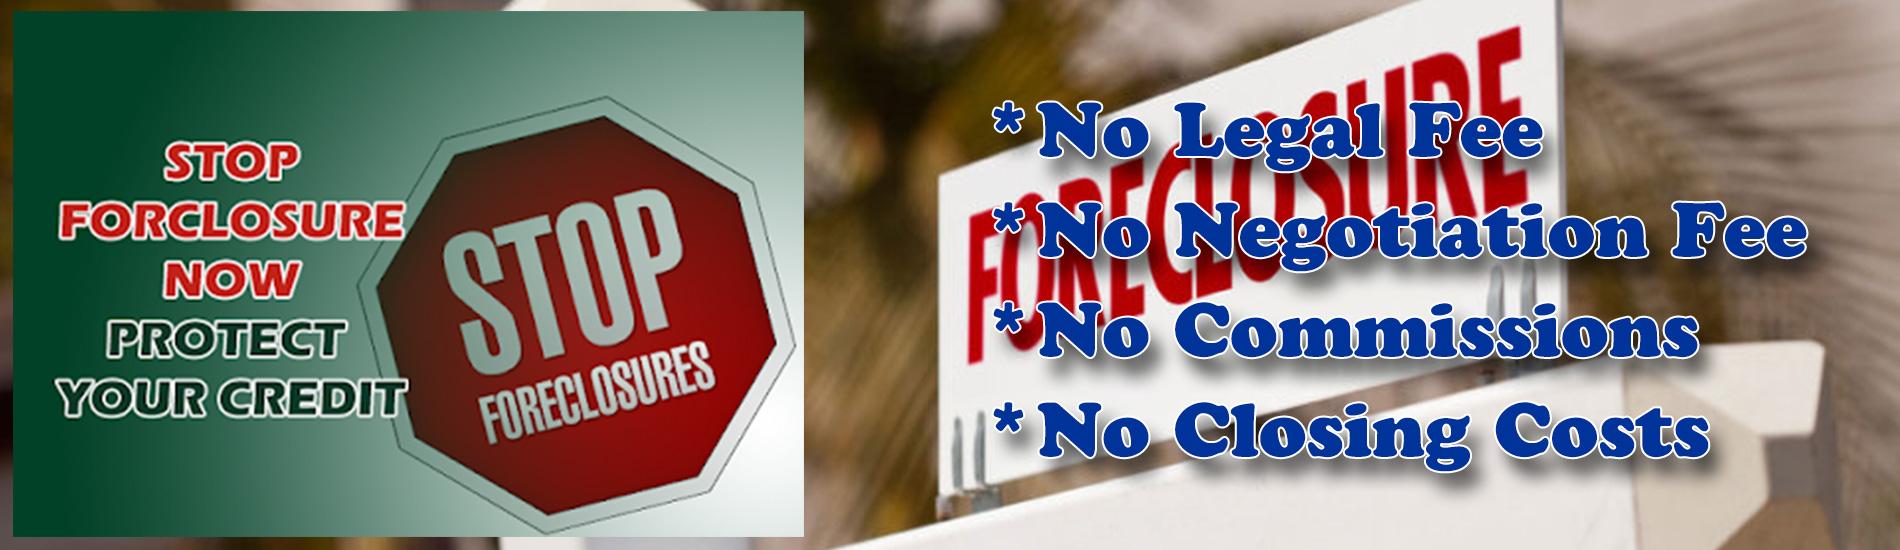 Free Foreclosure Help